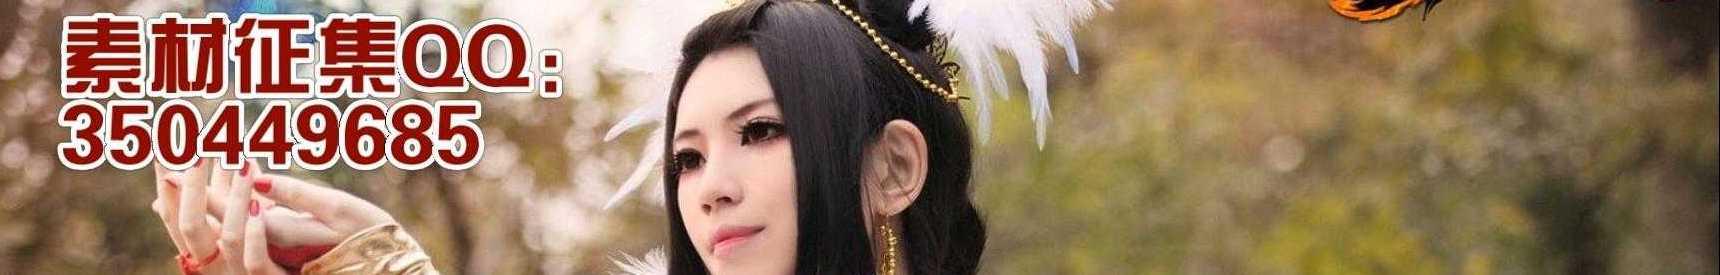 梦三国GGM模范老师 banner